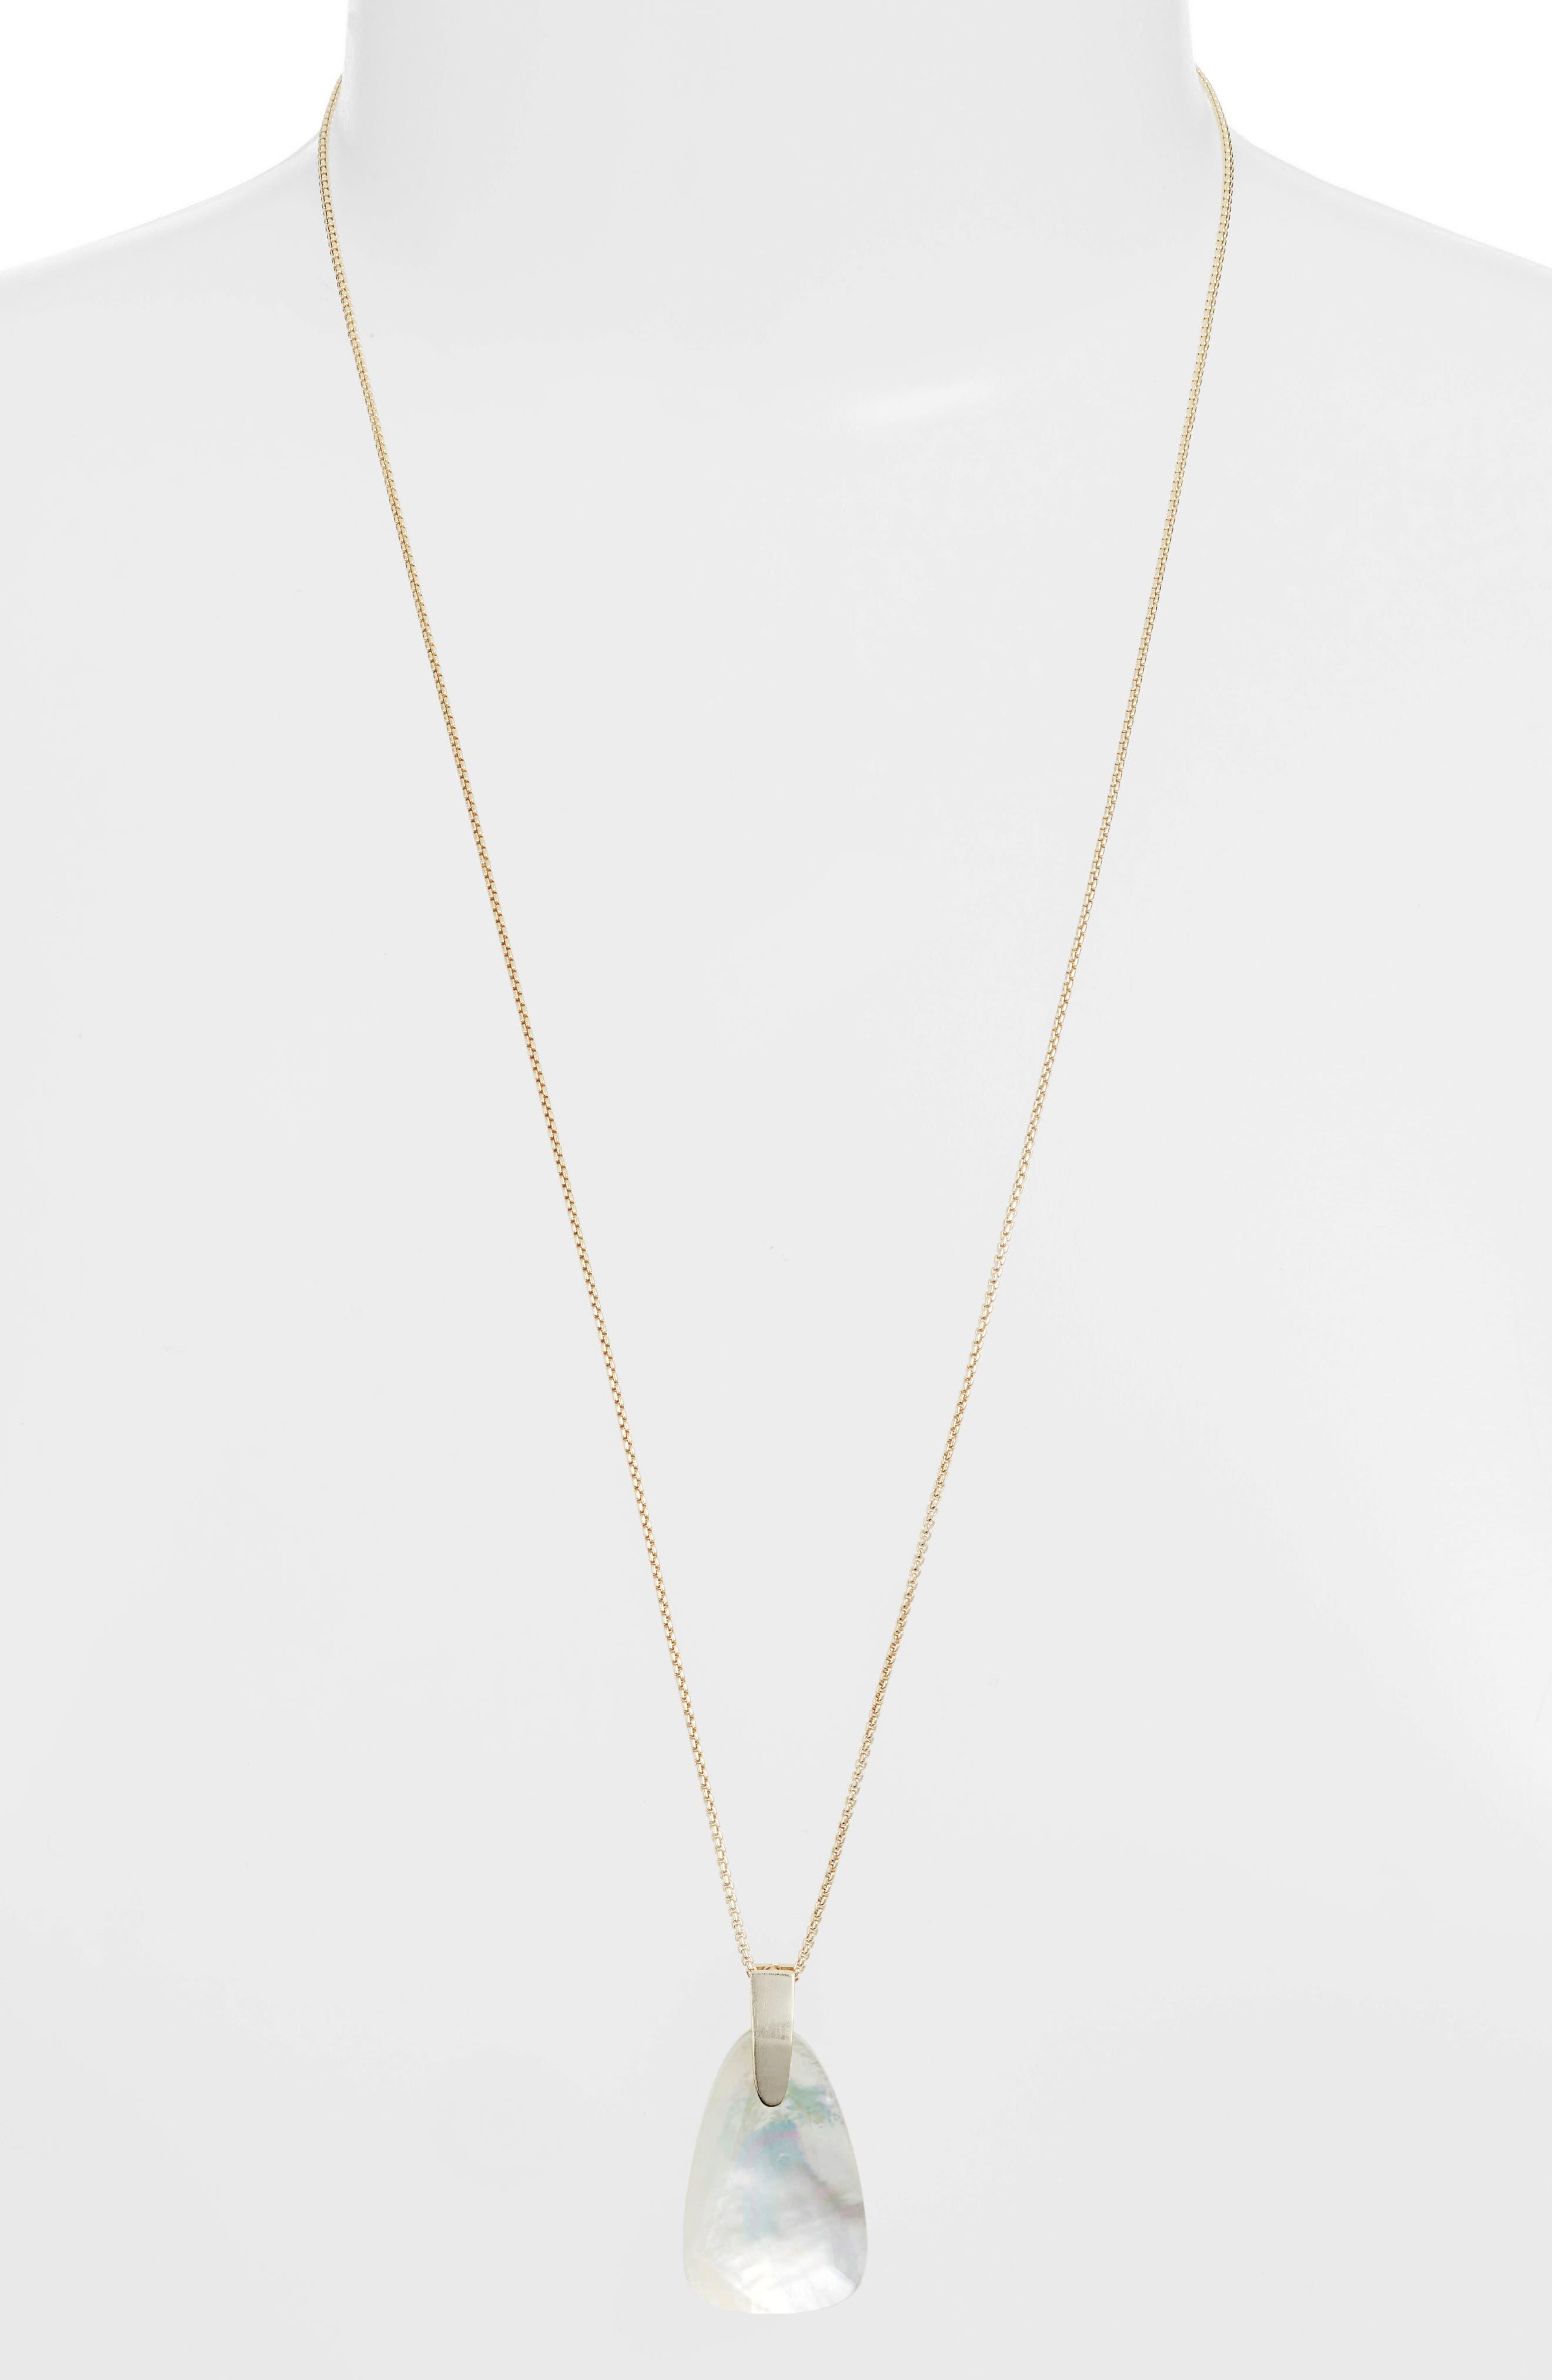 KENDRA SCOTT Maeve Long Stone Pendant Necklace in Gold/ Ivory